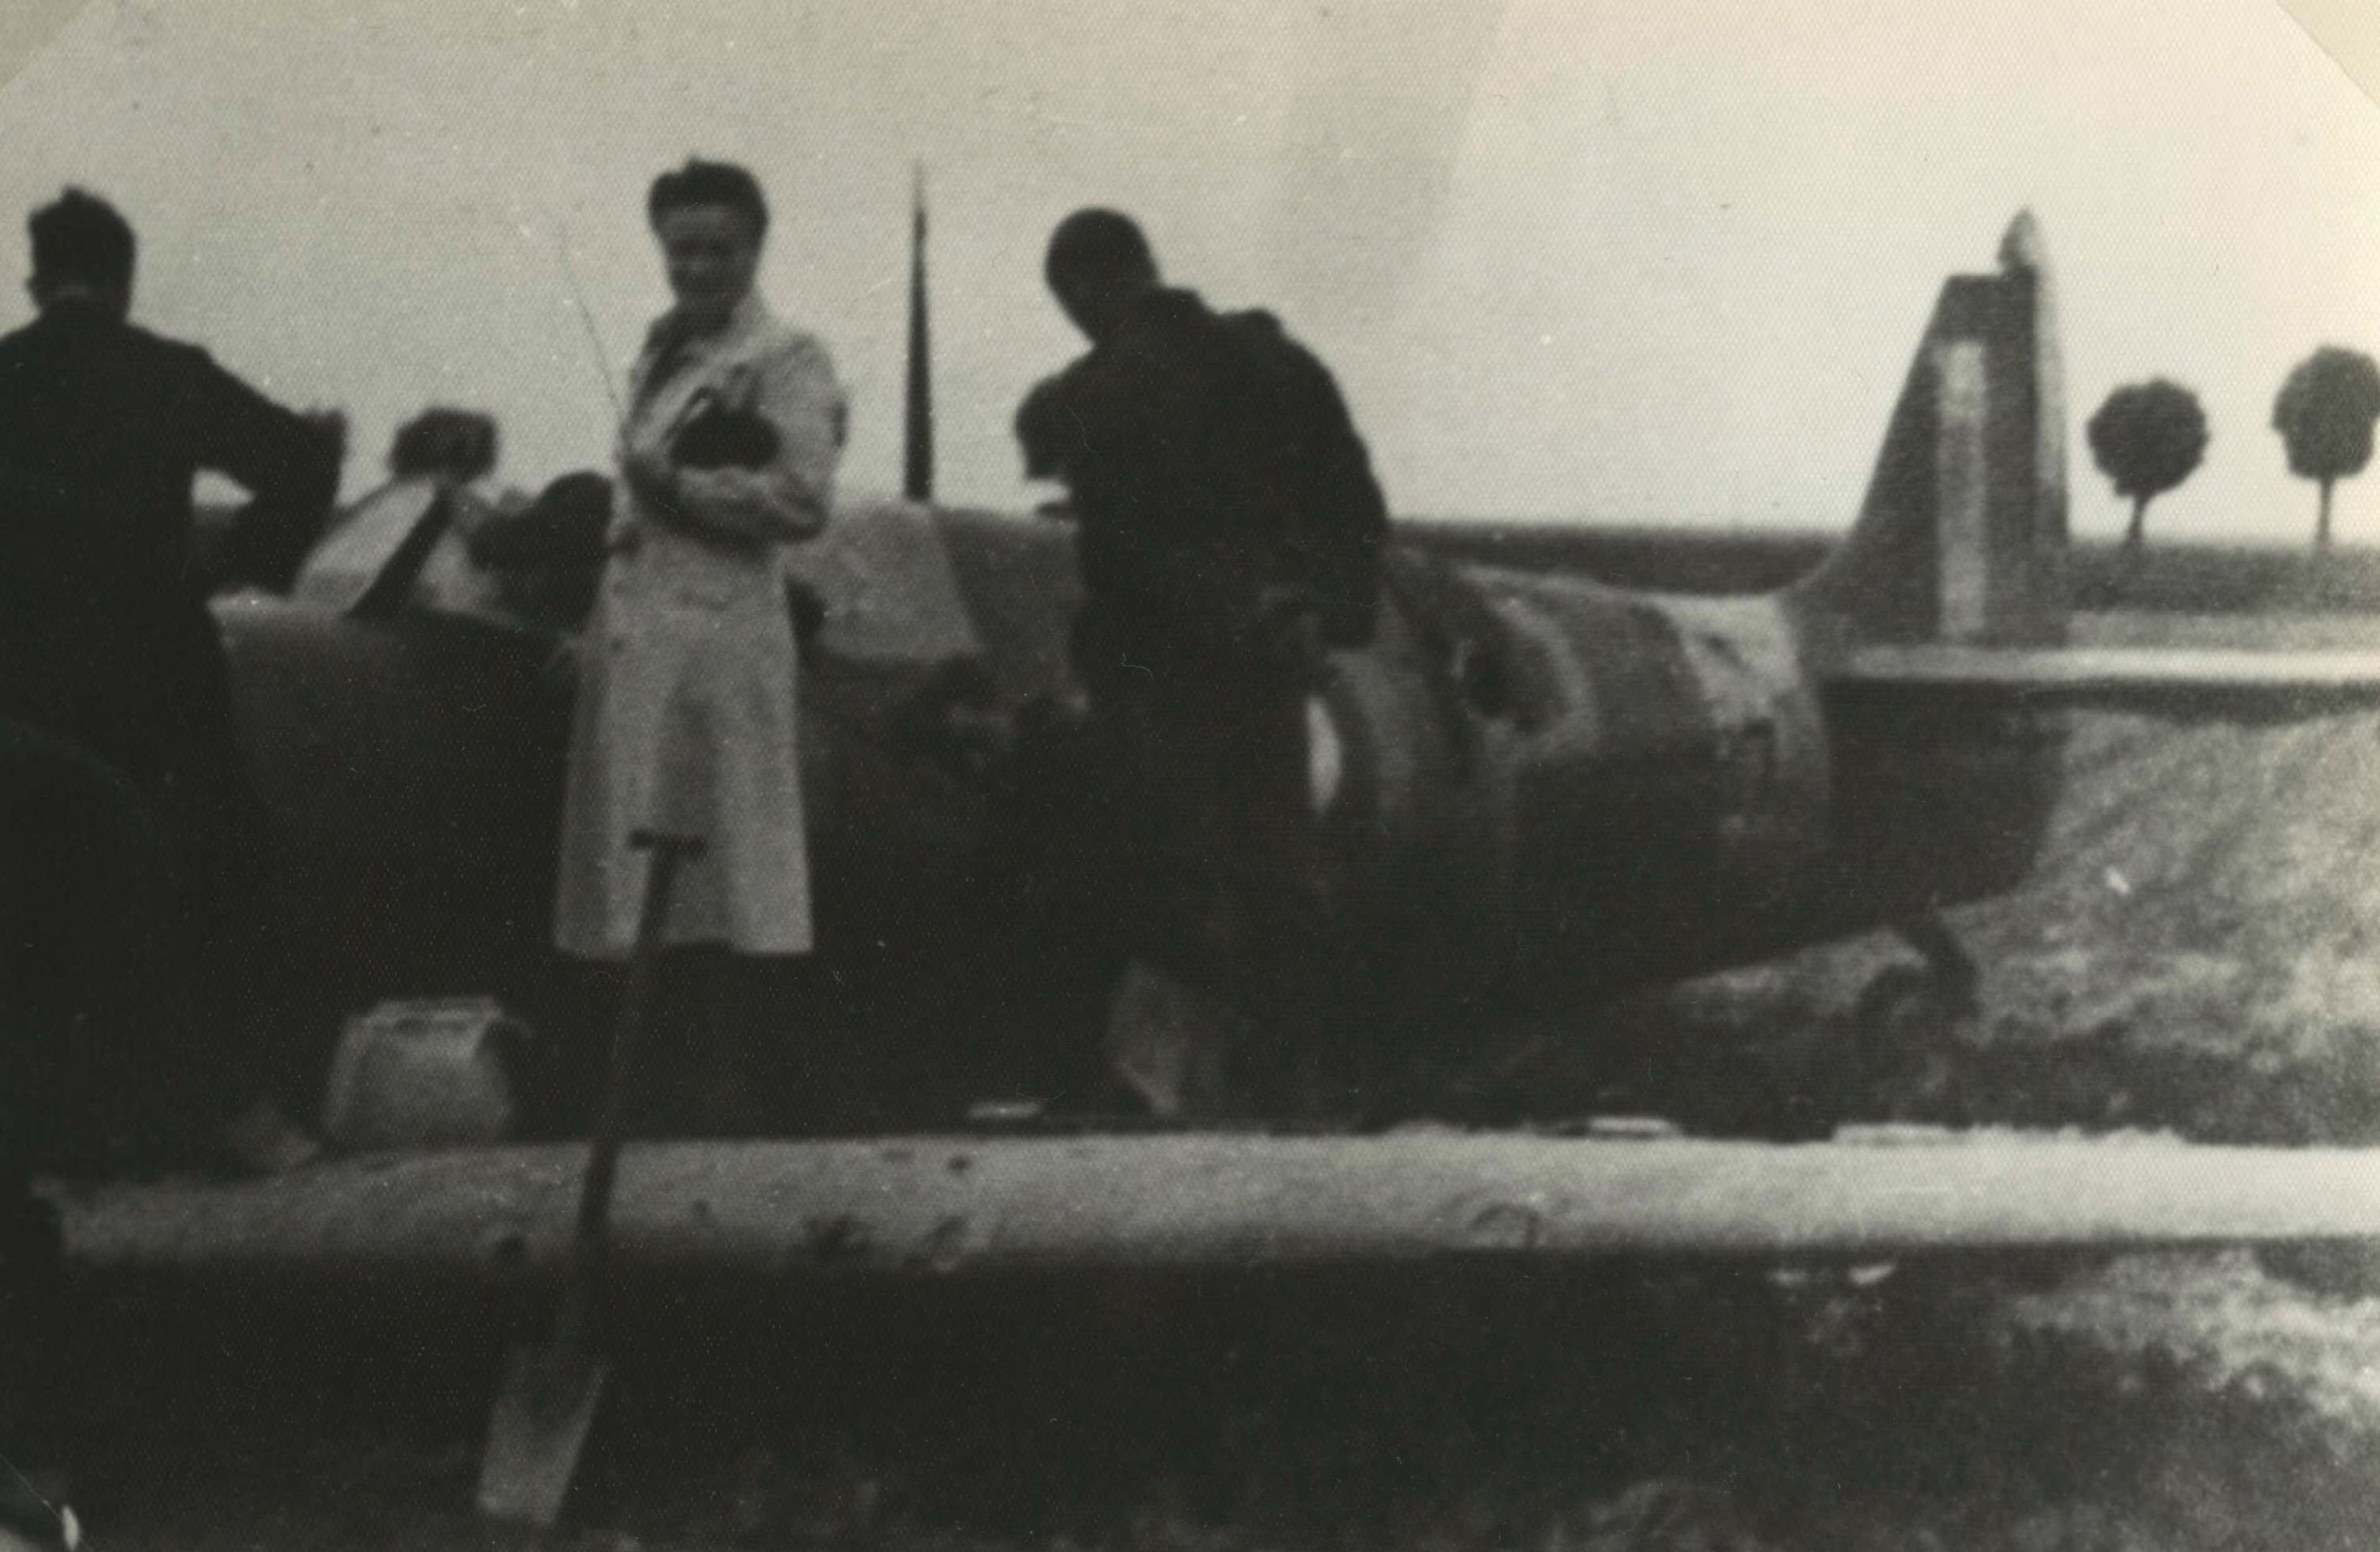 Spitfire RAF 66Sqn LZP Stevens P7787 sd by JG52 nr Groede 1POW 12th Aug 1941 NIOD2